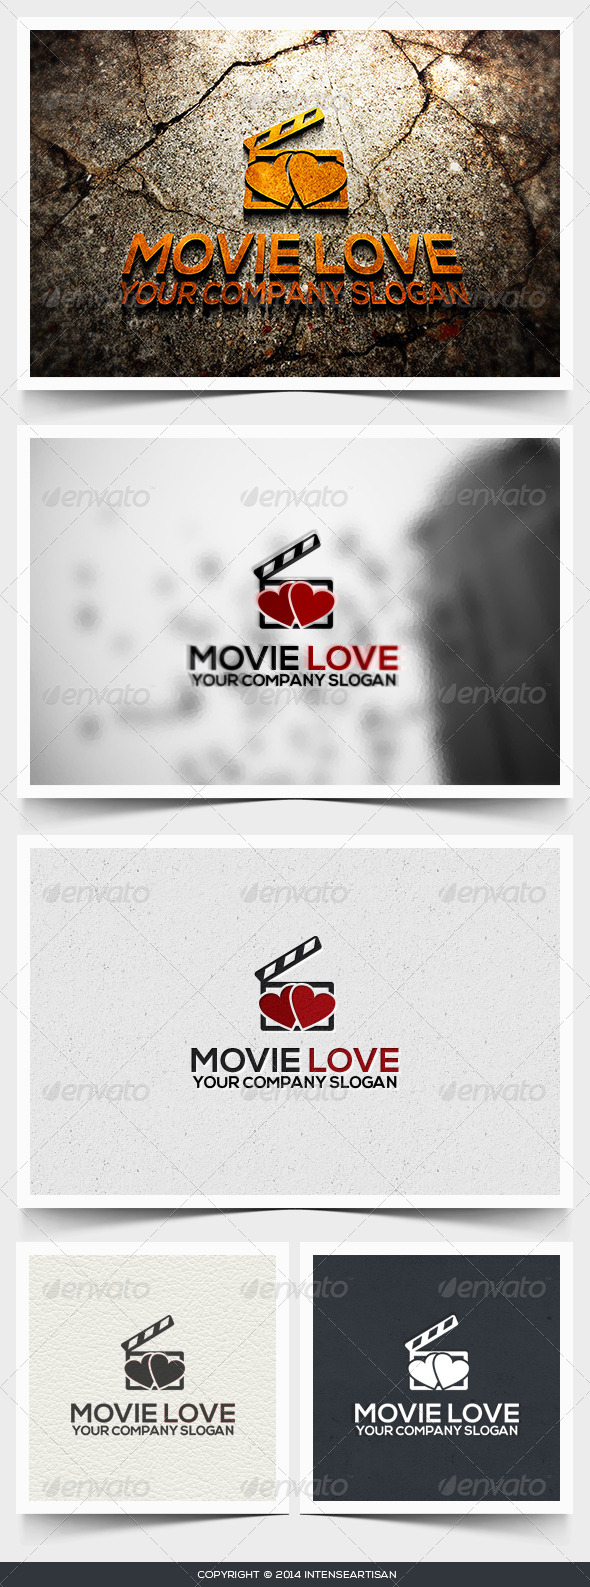 Movie Love Logo Template